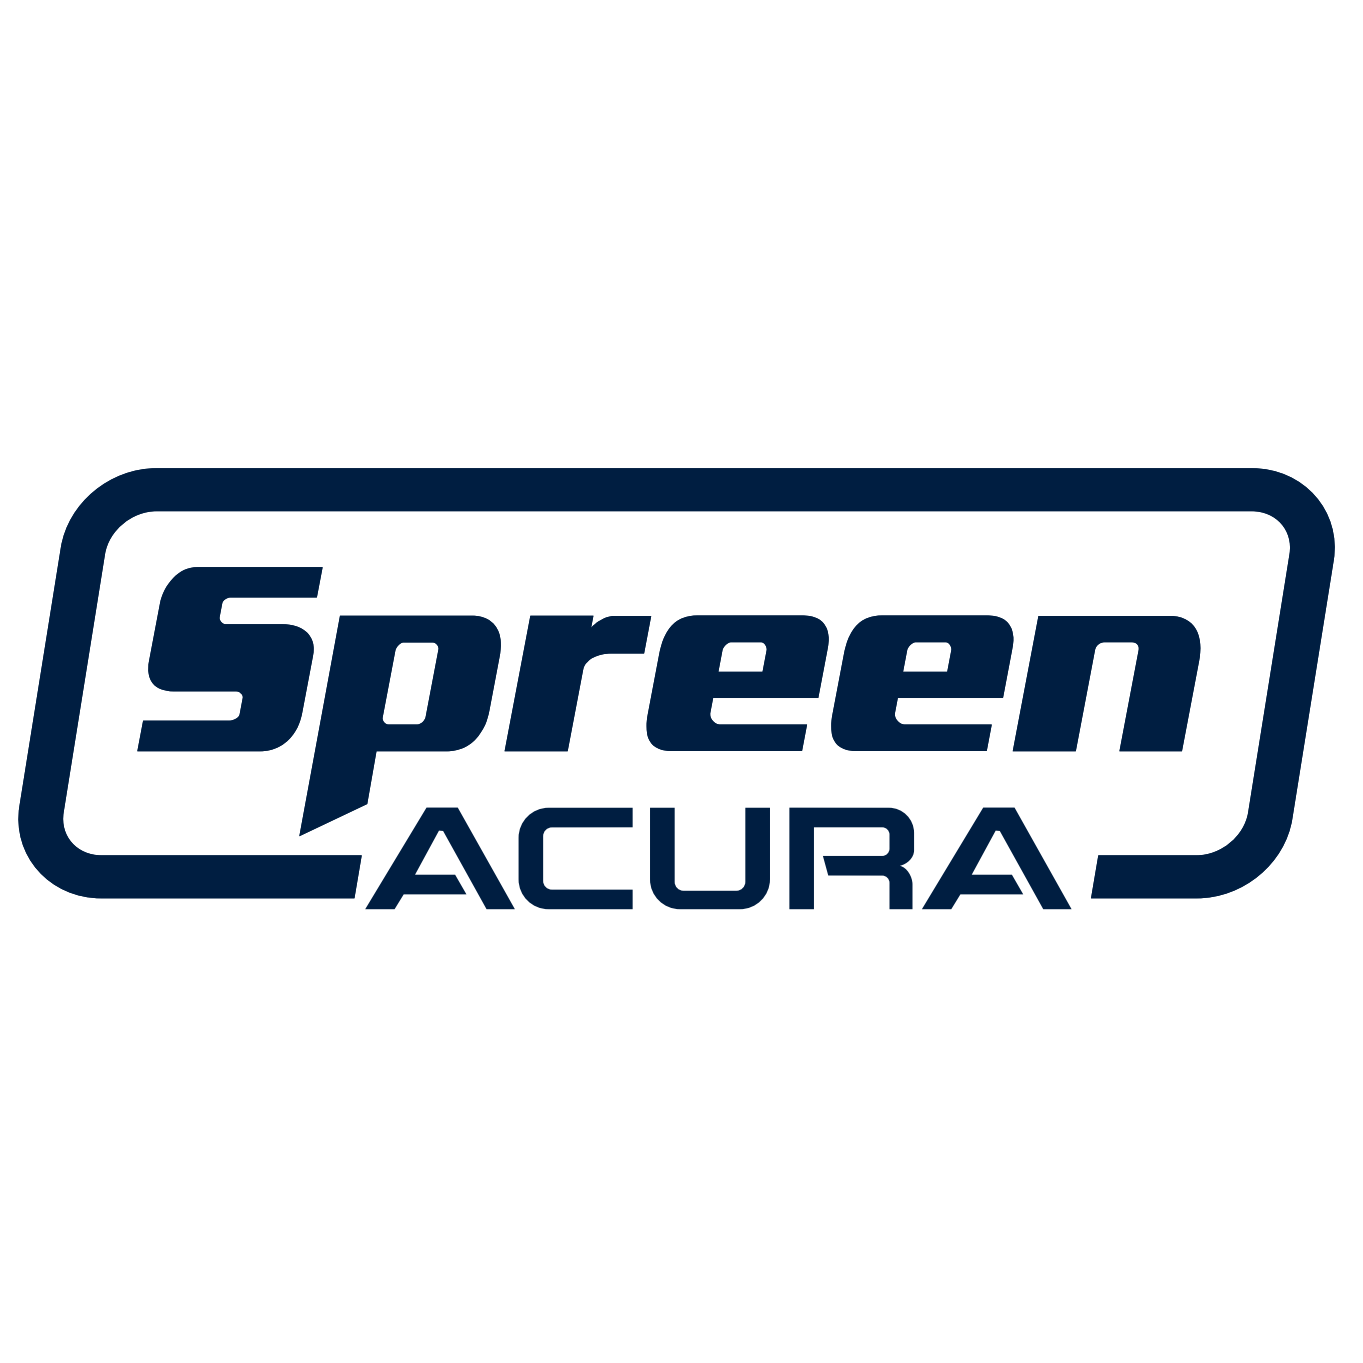 Spreen Acura - Riverside, CA - Auto Dealers